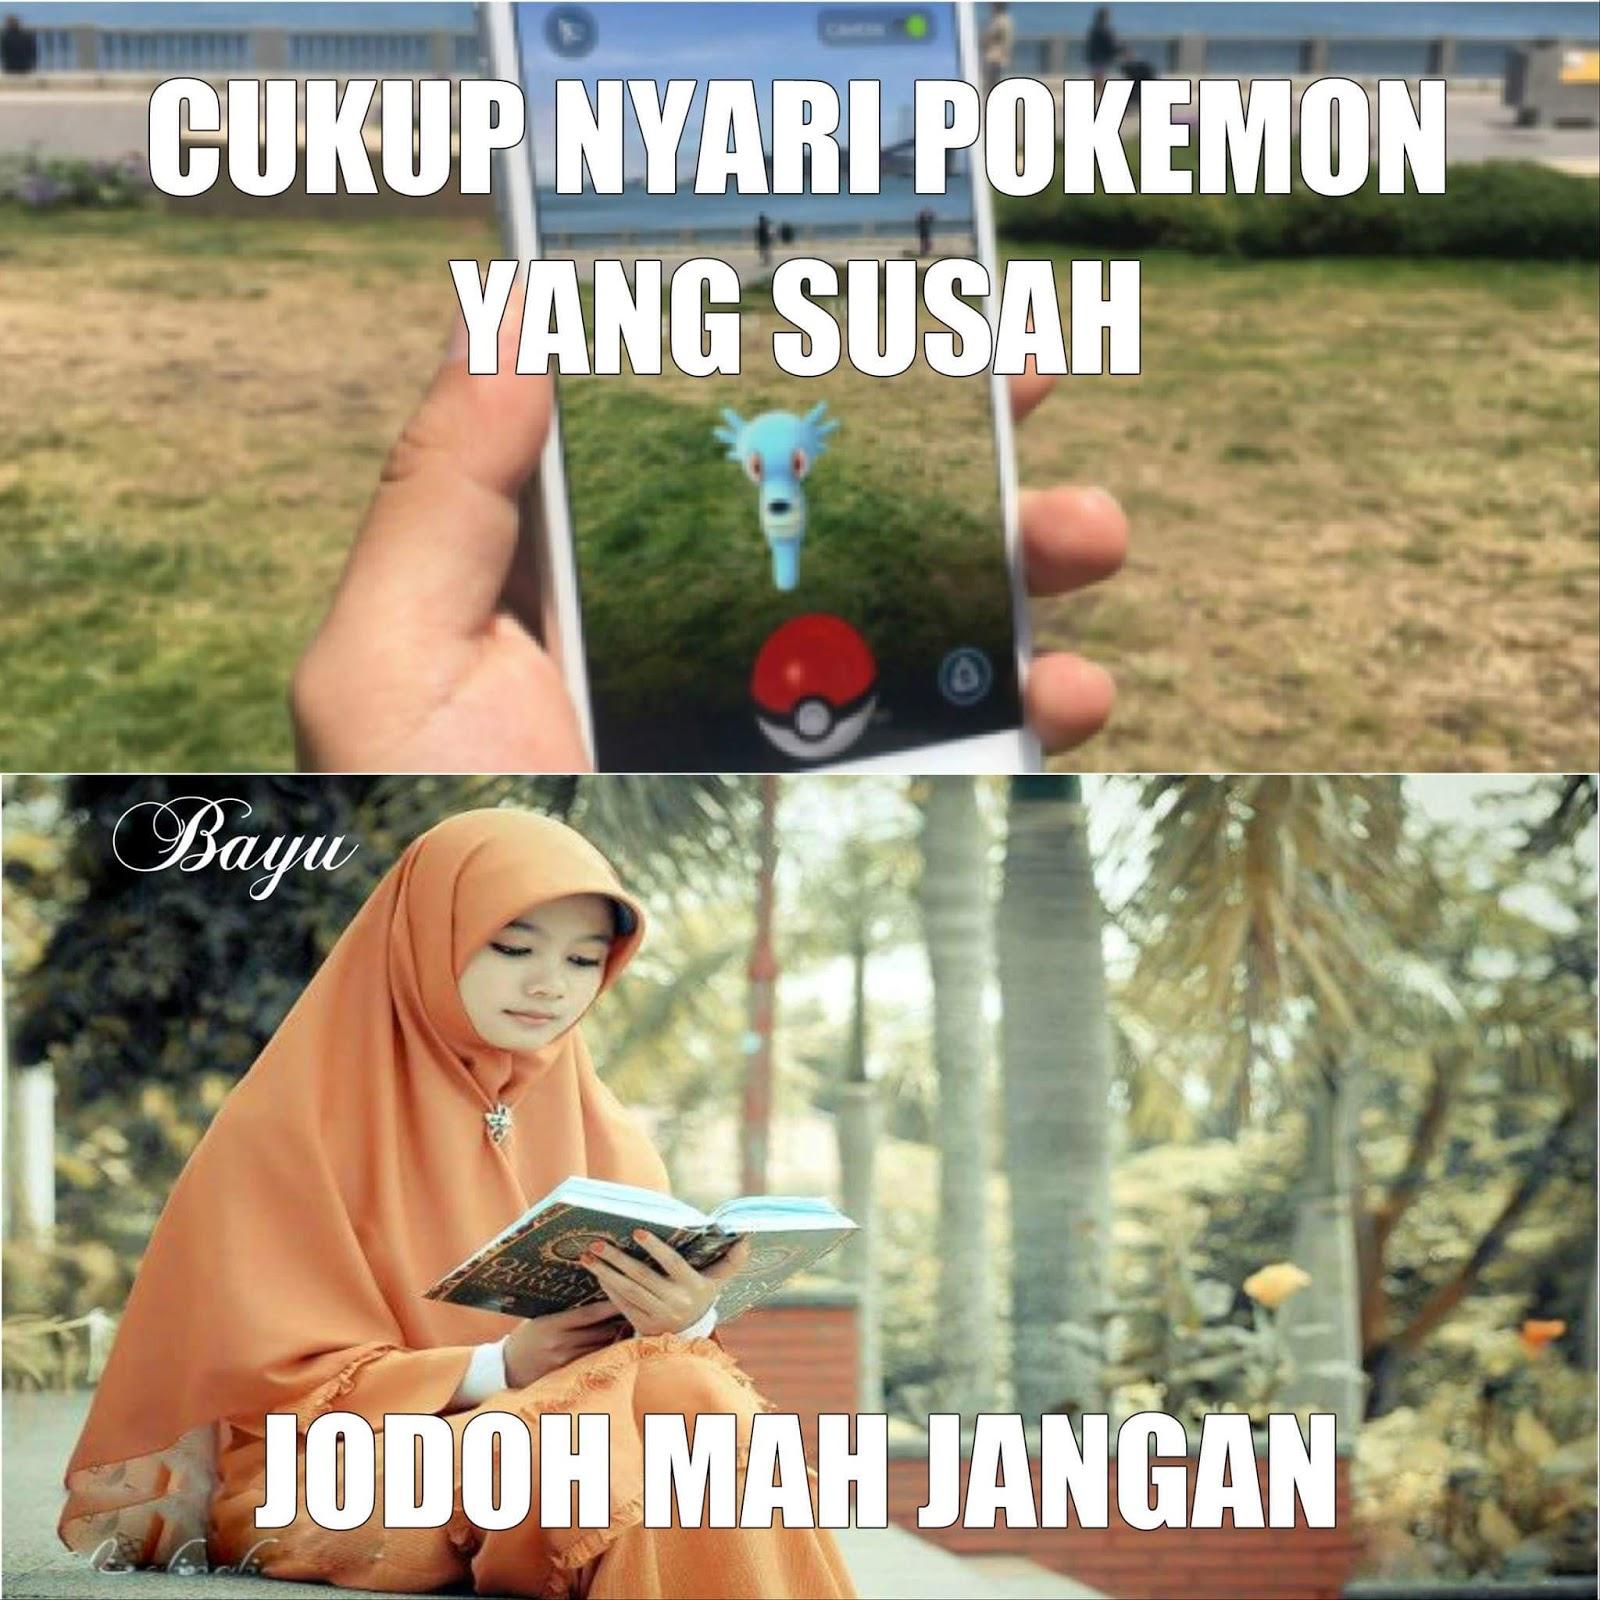 11 Meme Tentang Pokemon Go Yang Lucu Abies Howtogyga